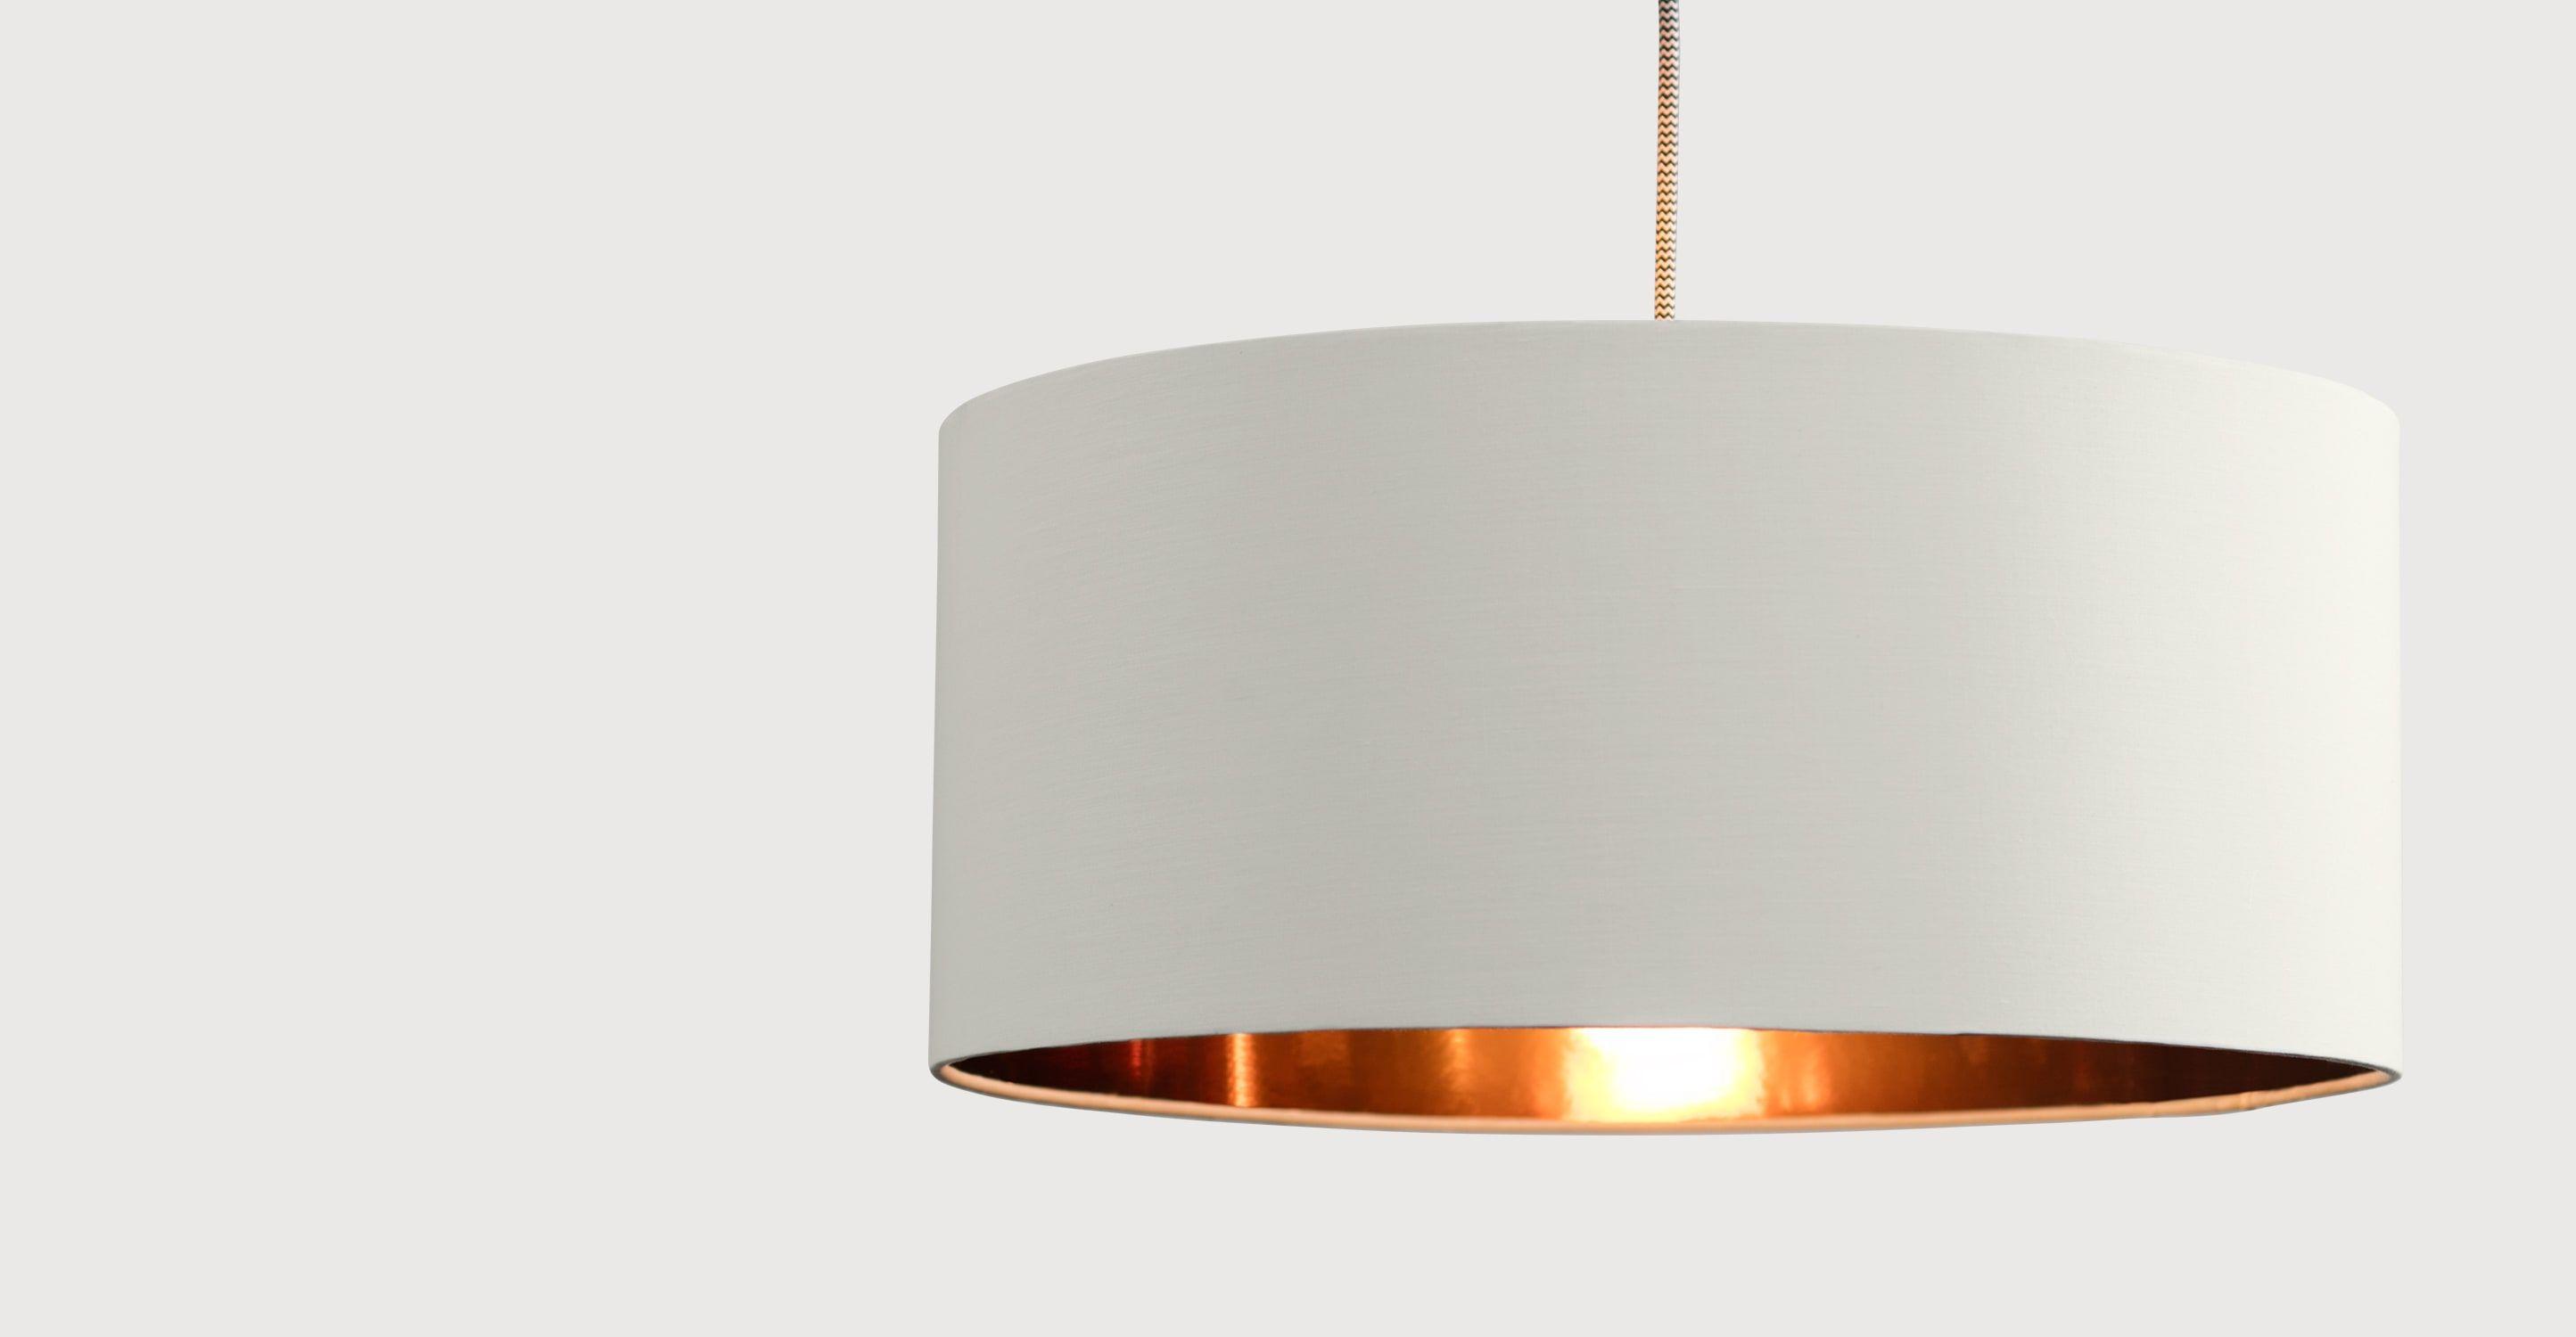 Moderne Lampen 68 : Hue lampenschirm ▻ entdecke moderne designmöbel jetzt bei made